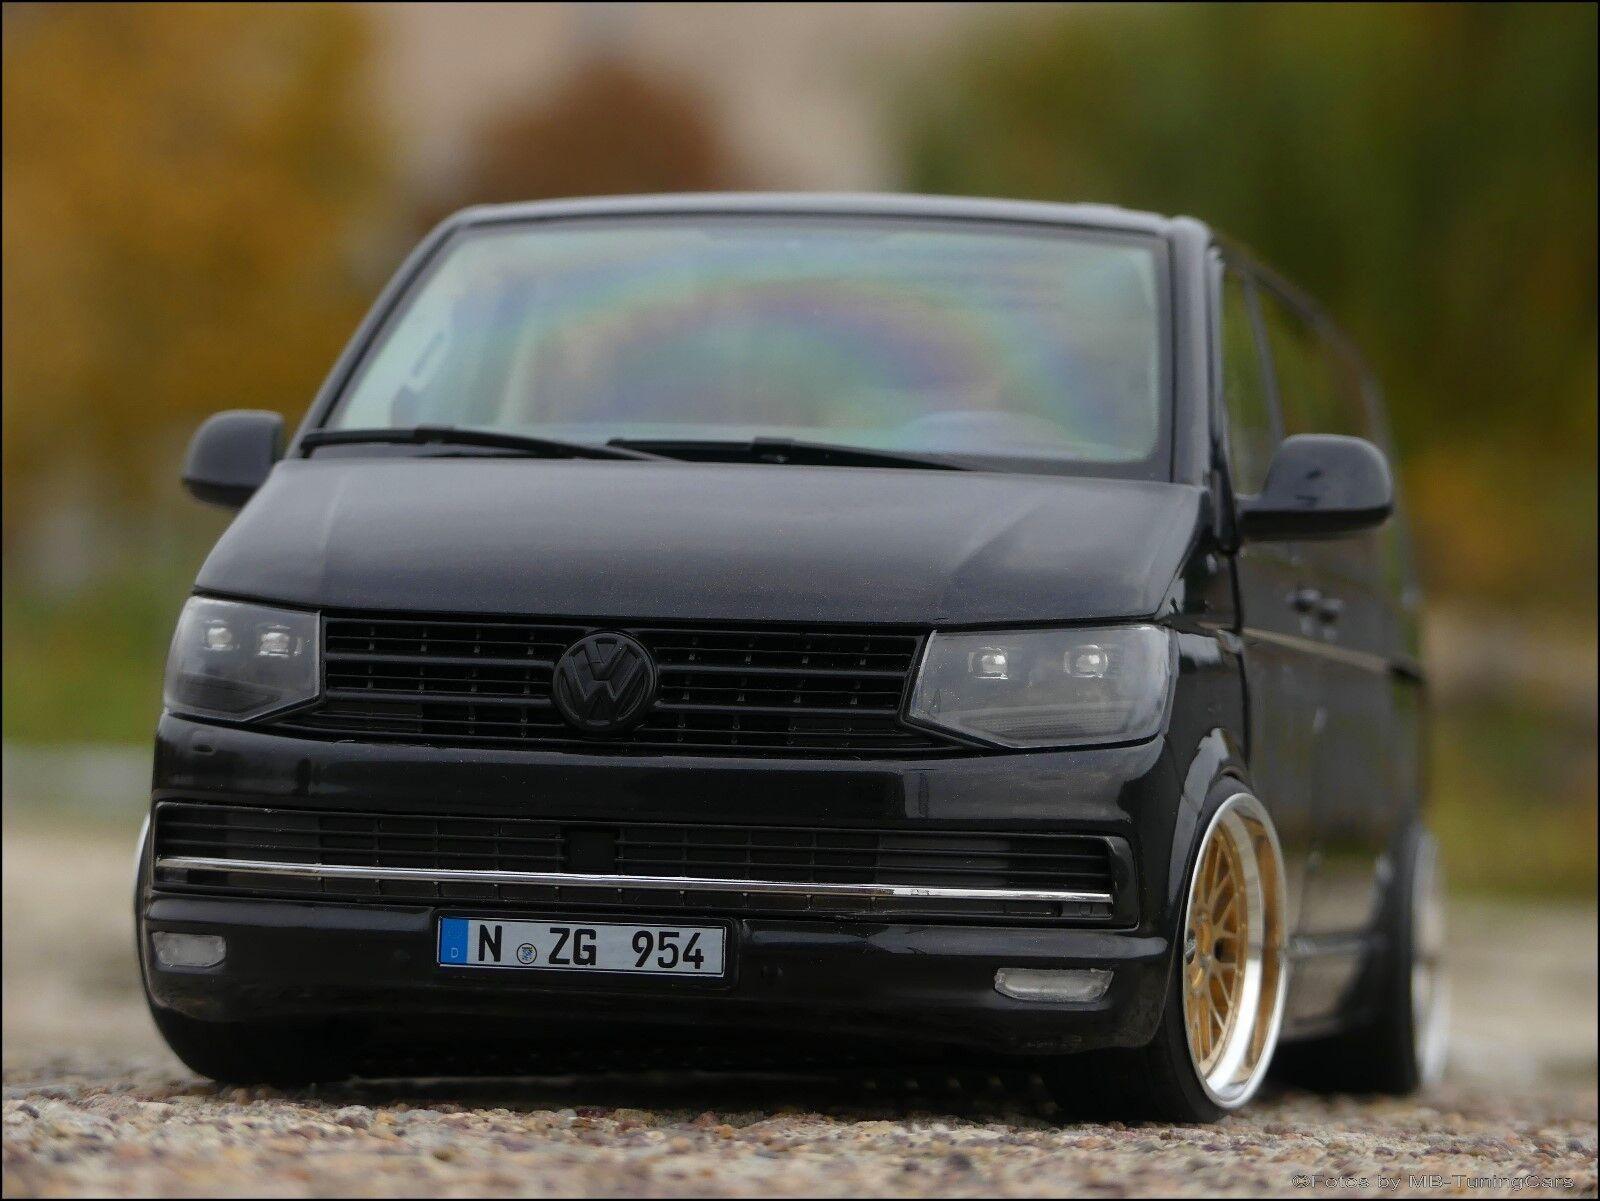 1 18 tuning VOLKSWAGEN VW t6 Multivan Highline avec or BBS LM Alu-PVC-Jantes